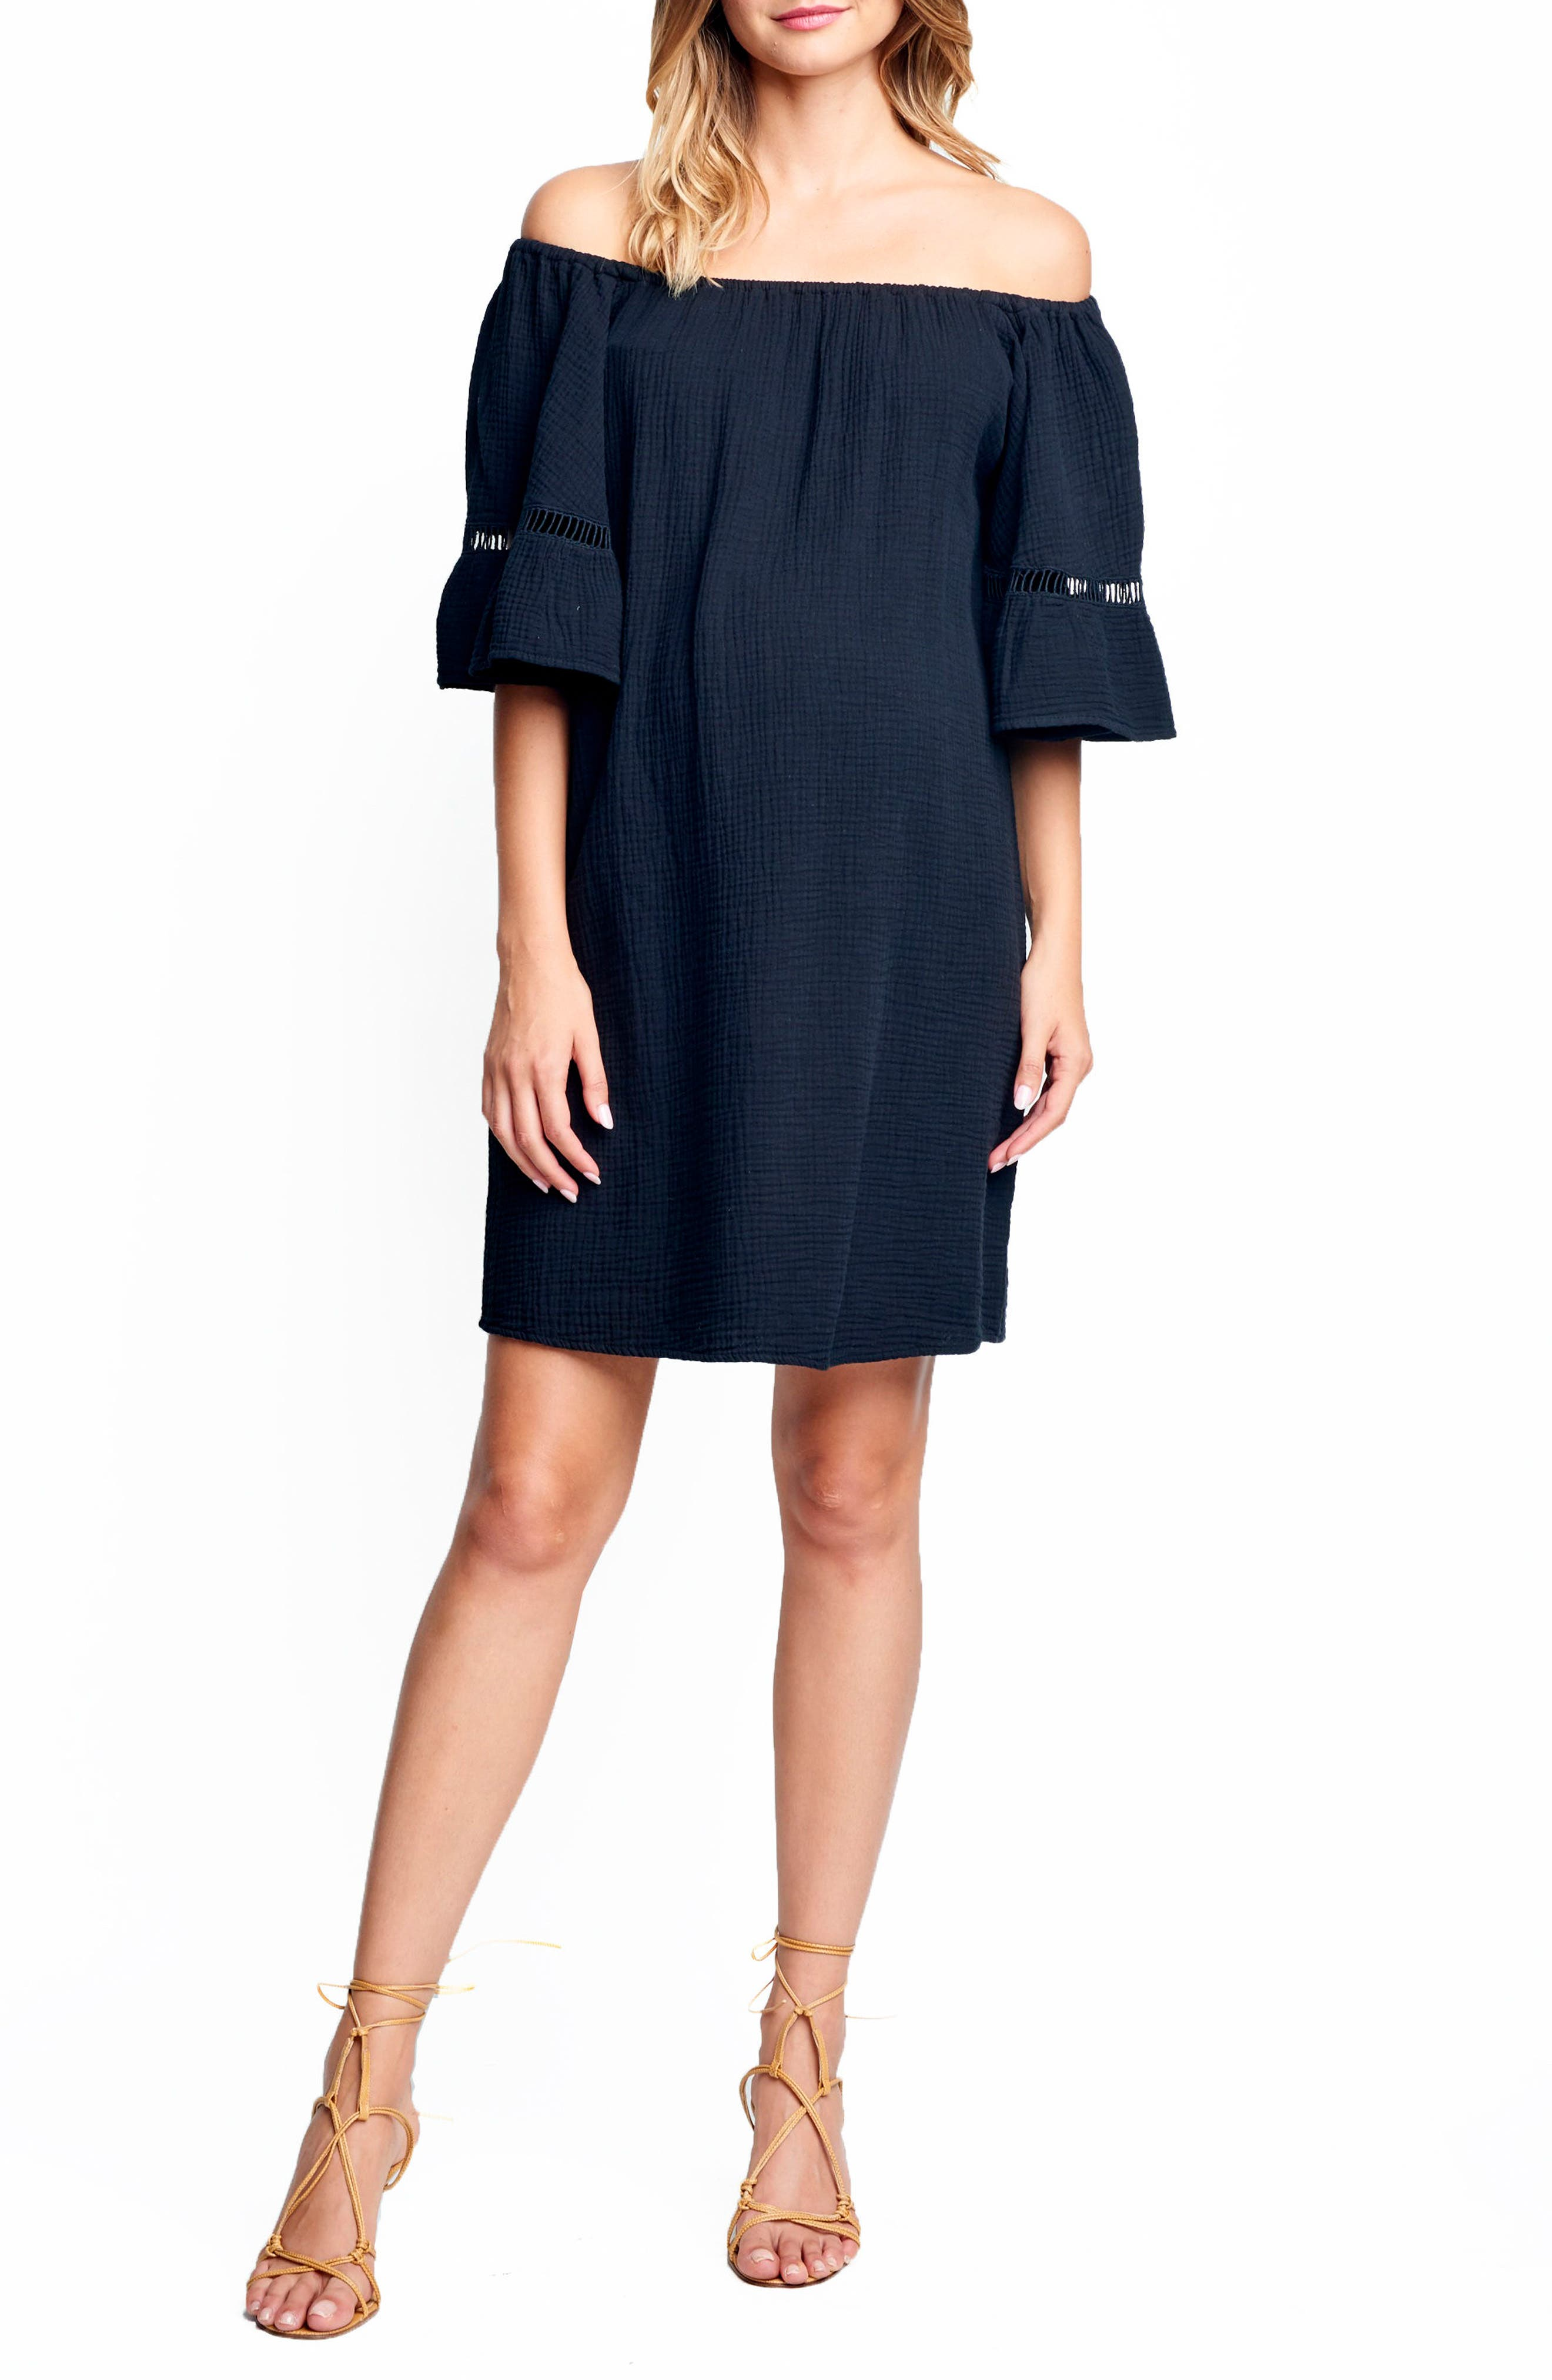 MATERNAL AMERICA Off the Shoulder Maternity Dress, Main, color, 001